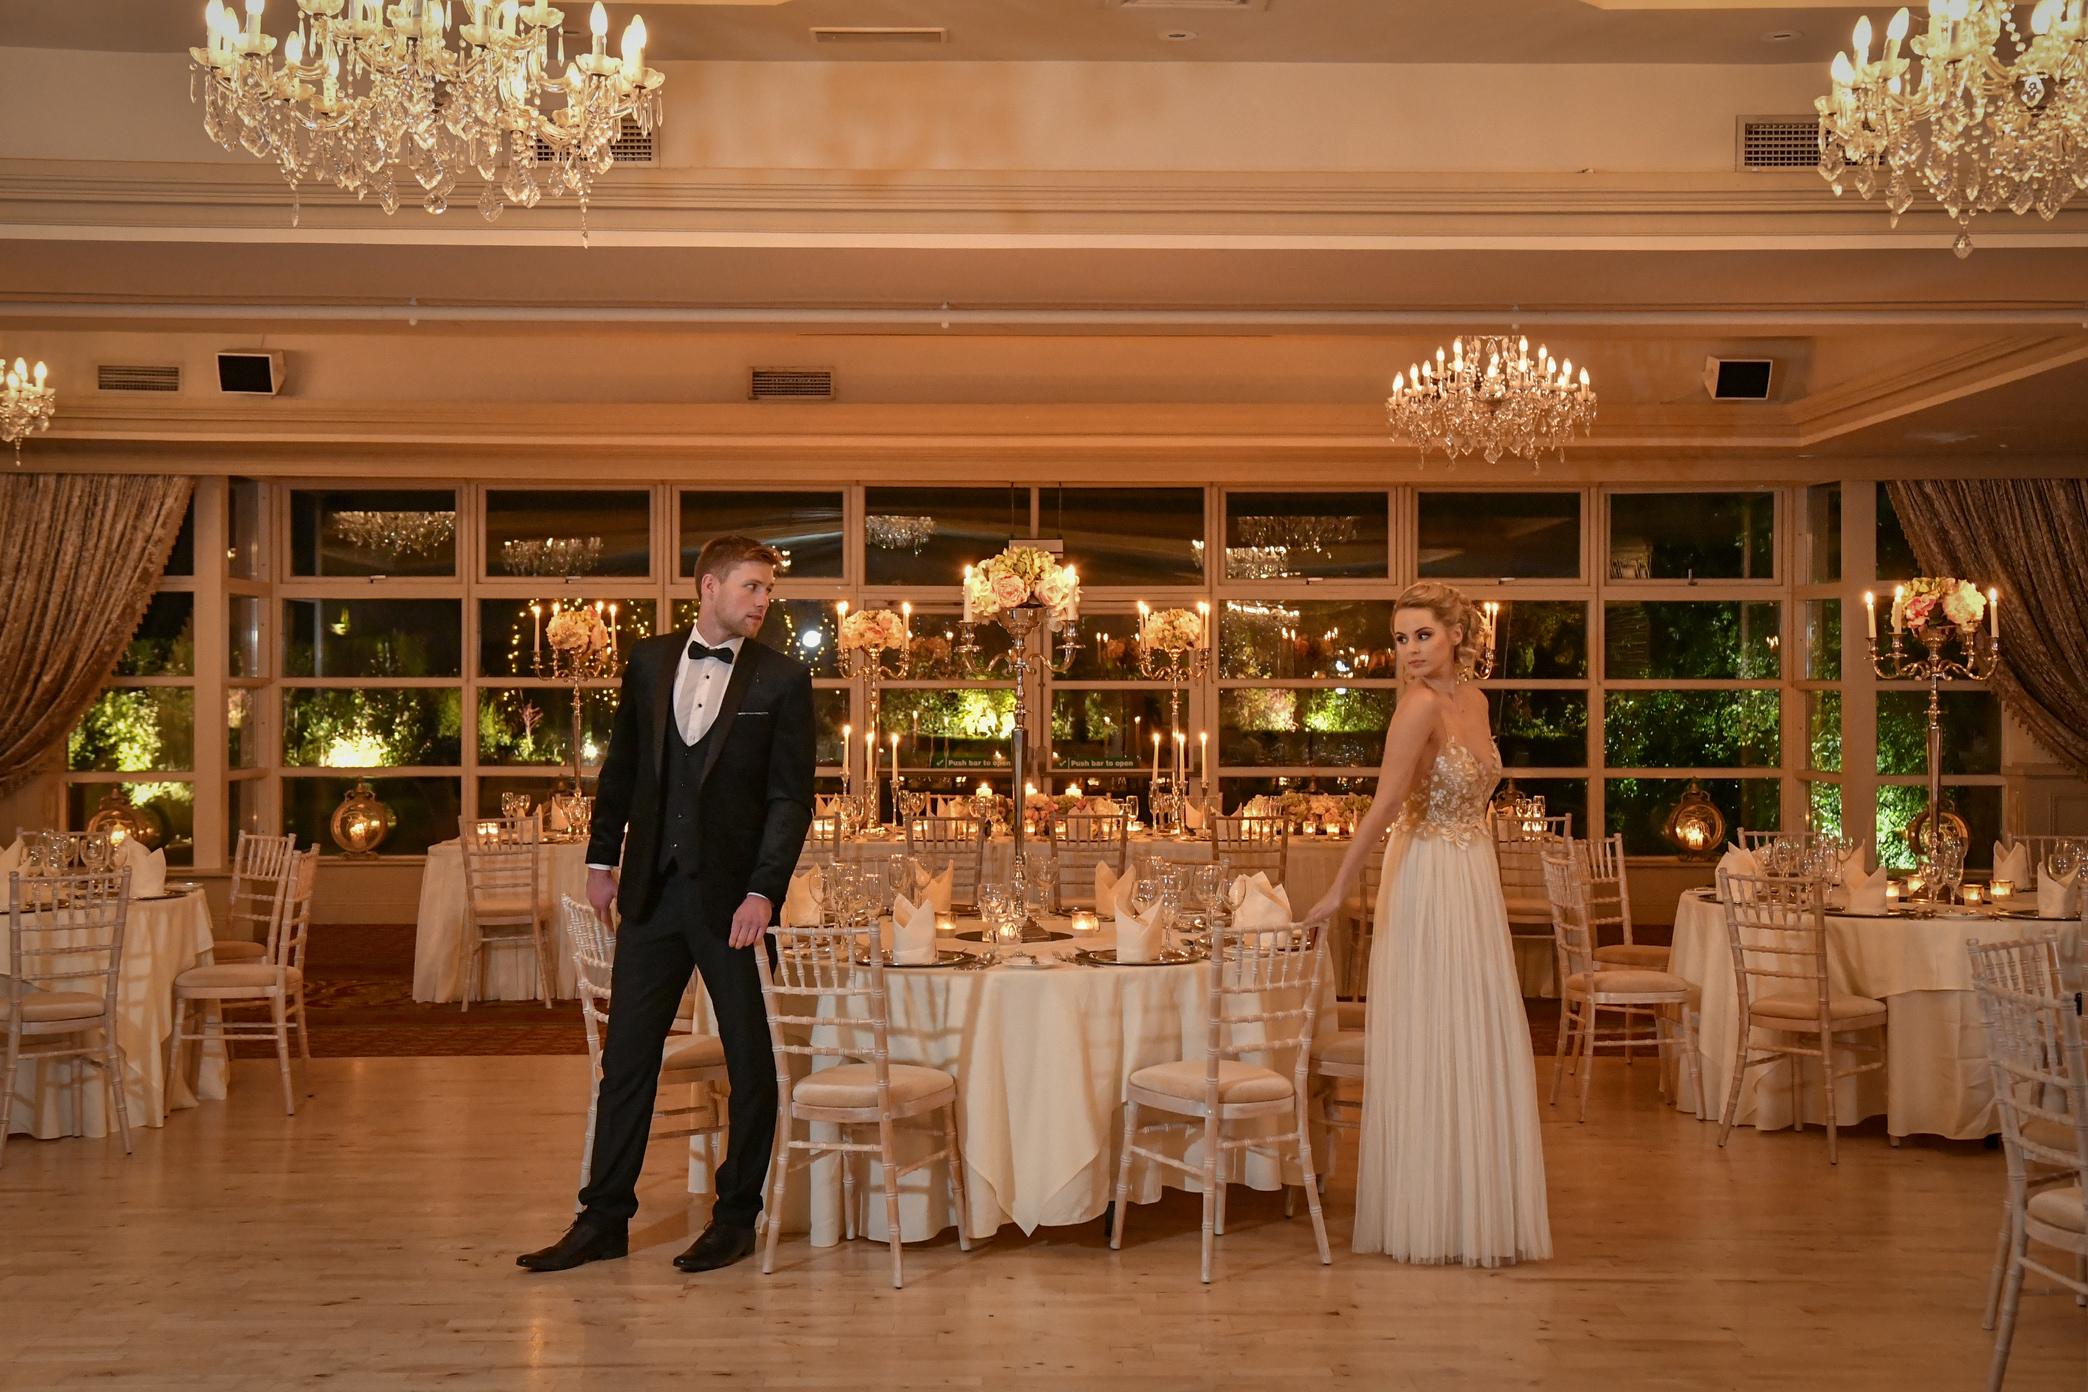 Bride & Groom in Candlelit Ballroom wide shot-min